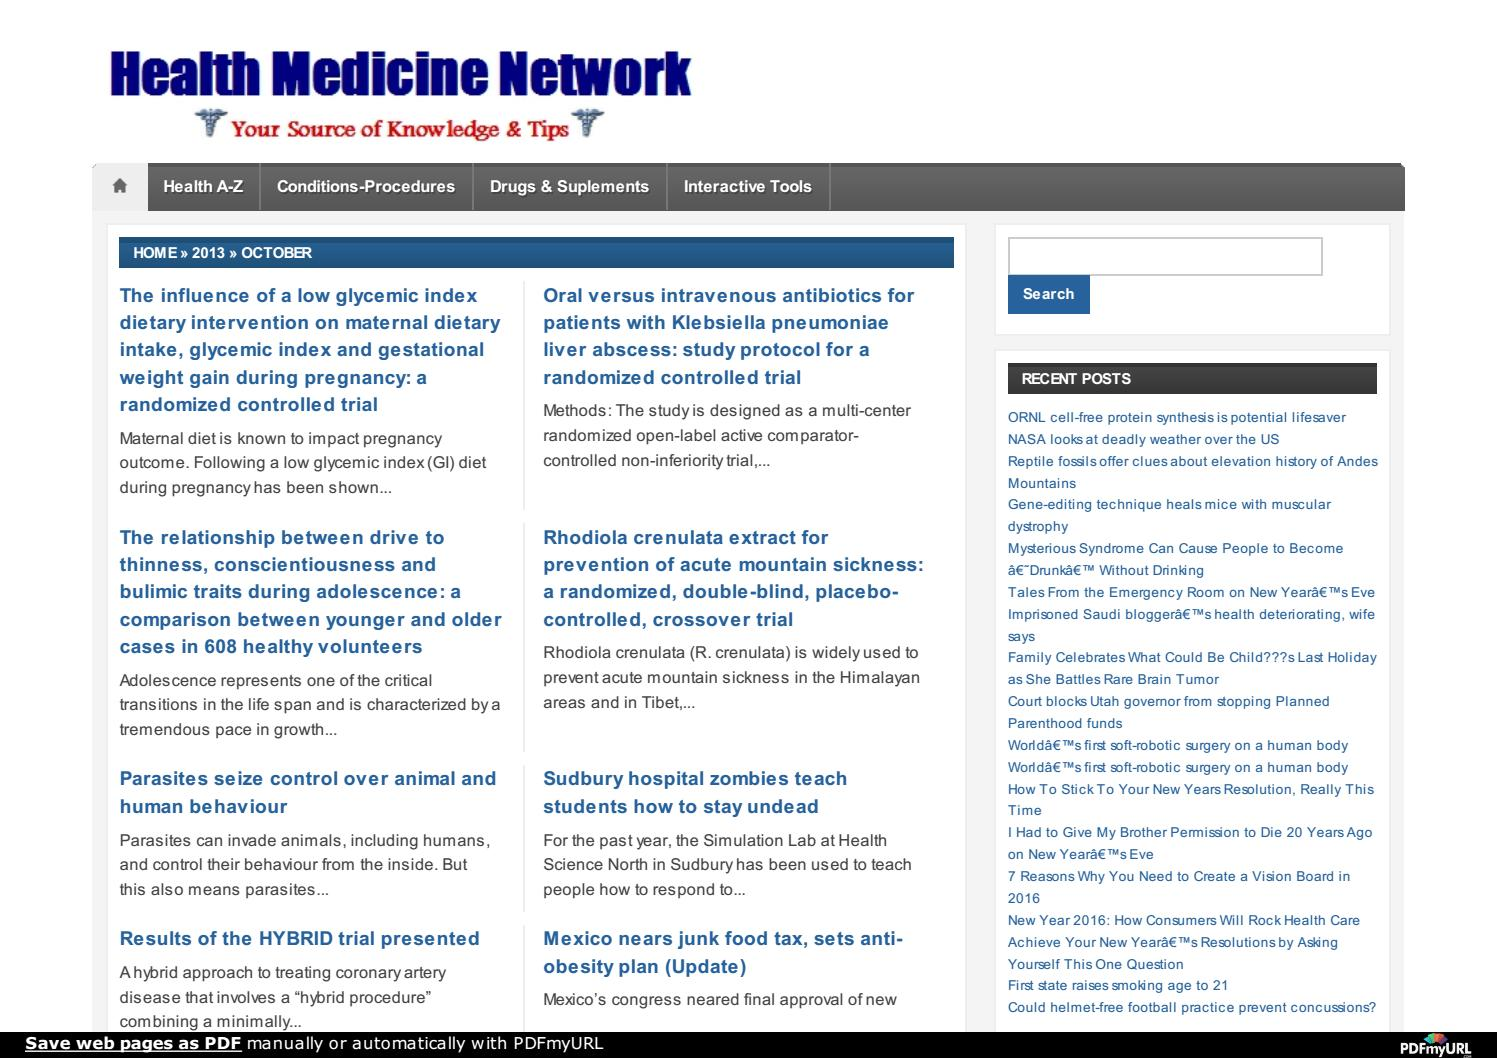 Ainhoa Madrid David Moreno Porno http healthmedicinet com ii 2013 10tuni sante - issuu